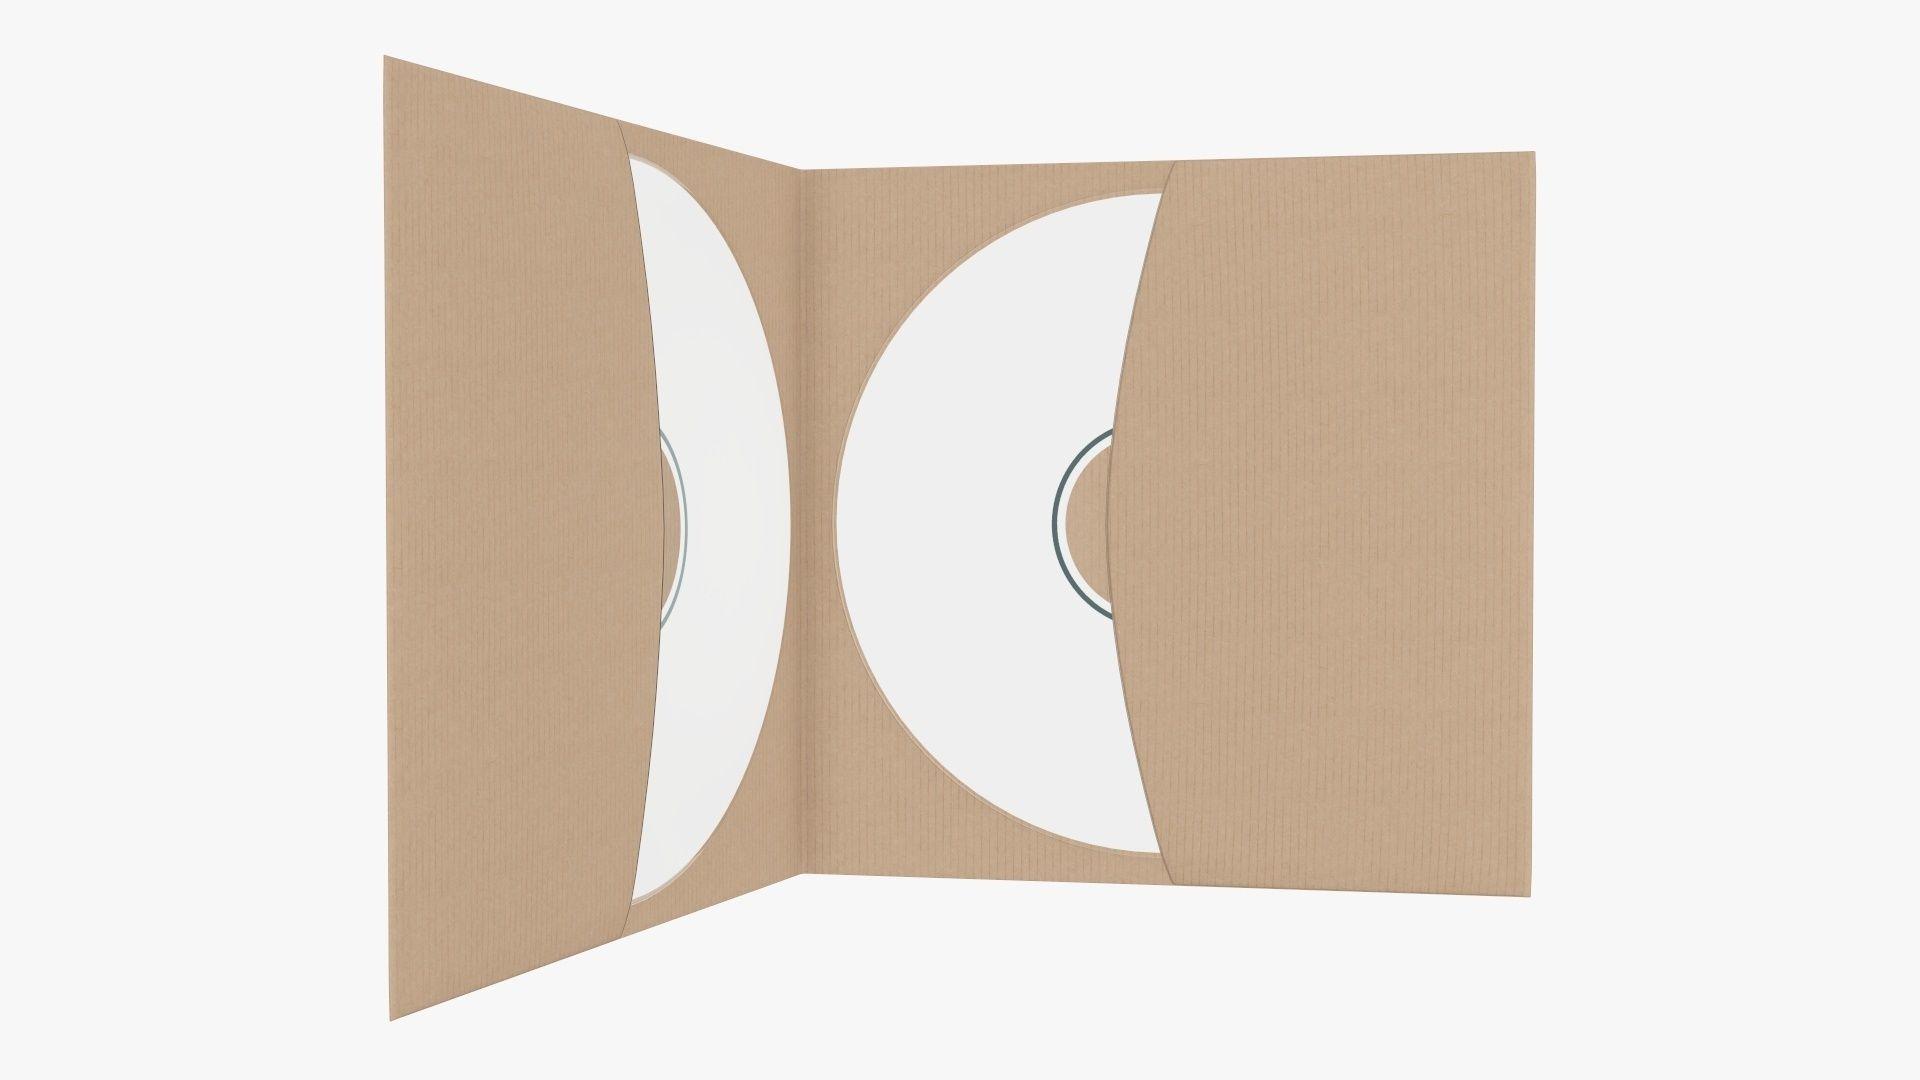 DVD in a paper brochure